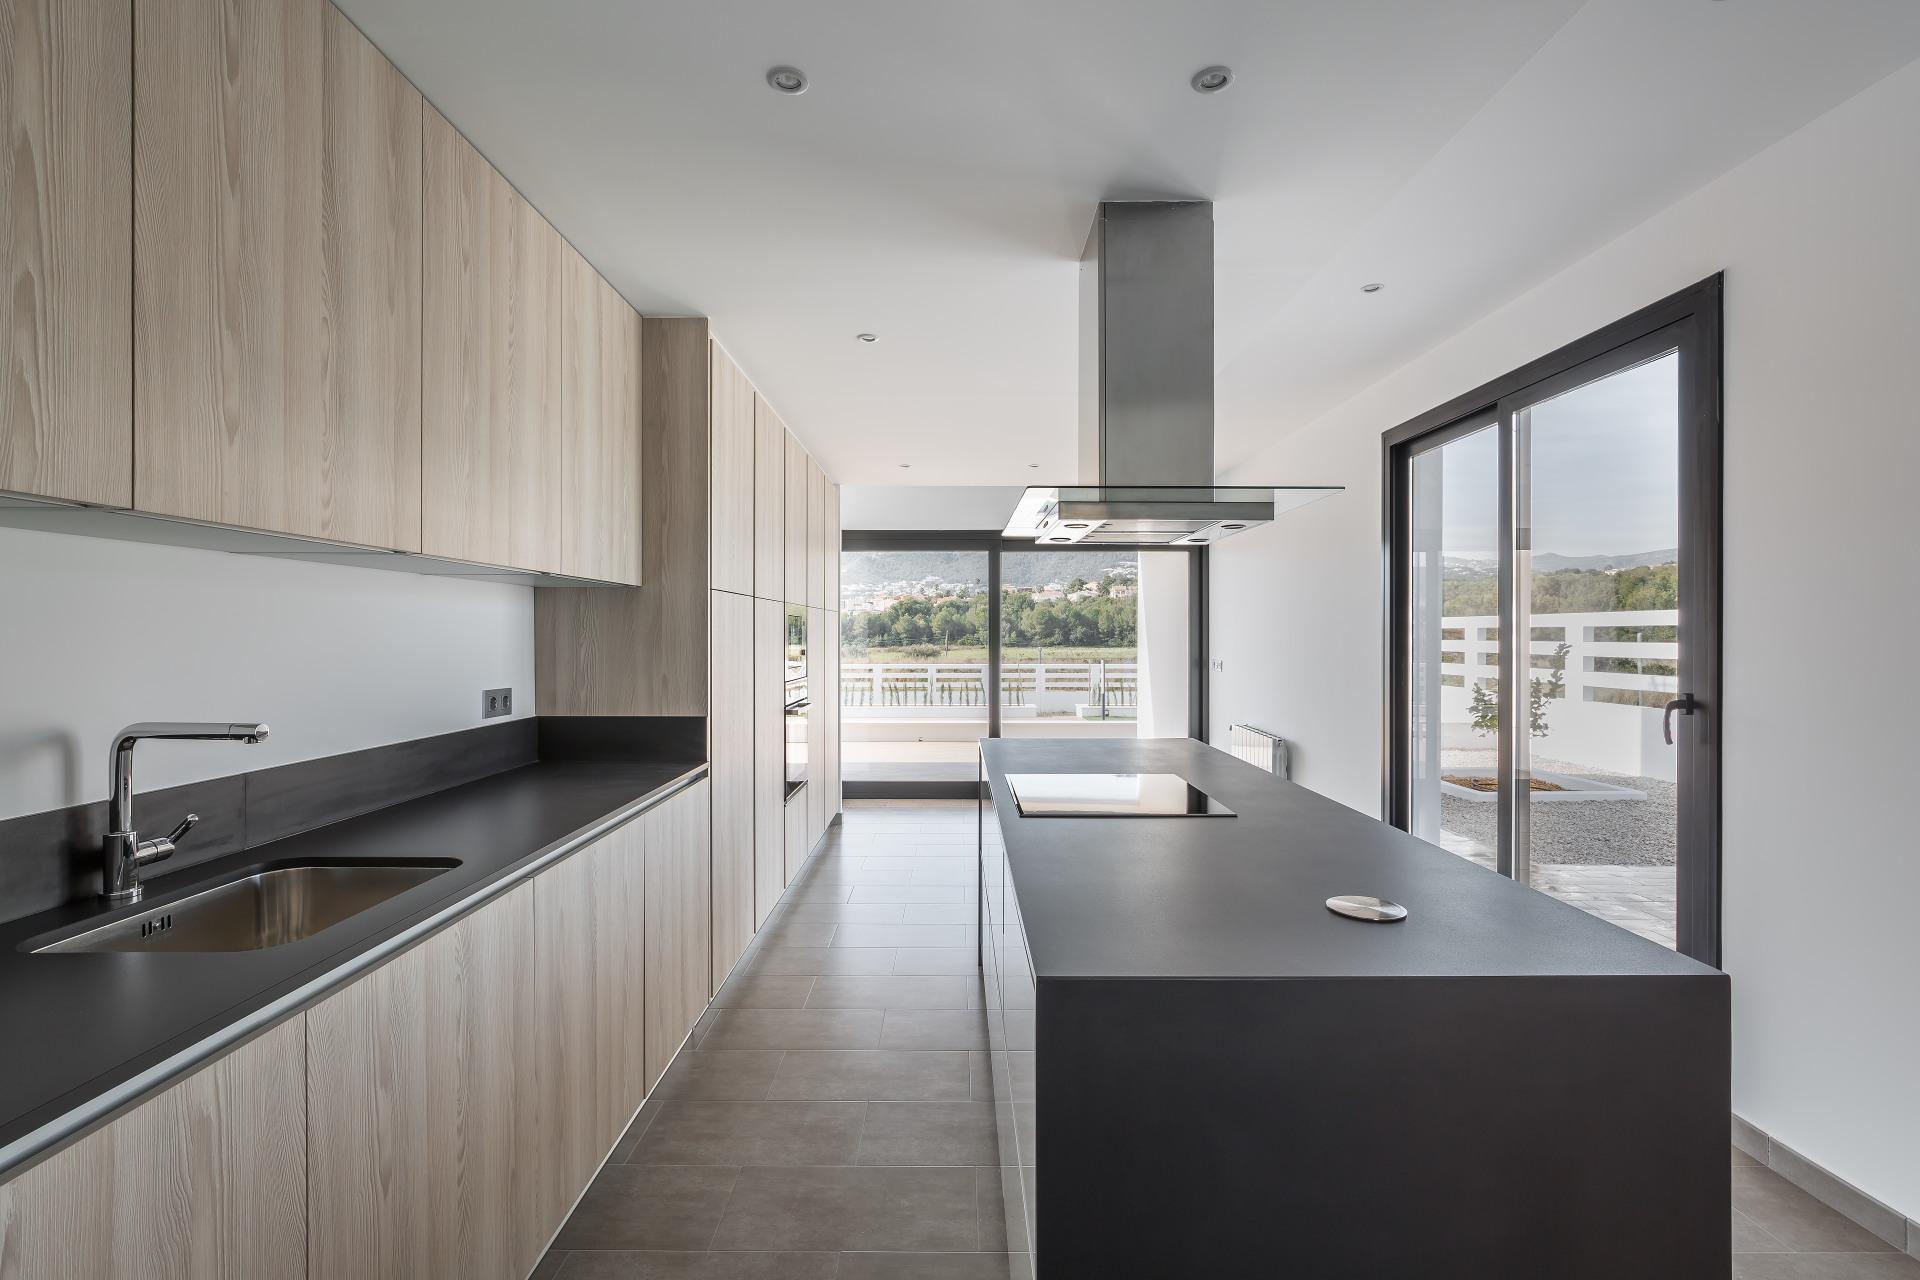 fotografia-arquitectura-valencia-german-cabo-viraje-vivienda-unifamiliar-calpe (32)